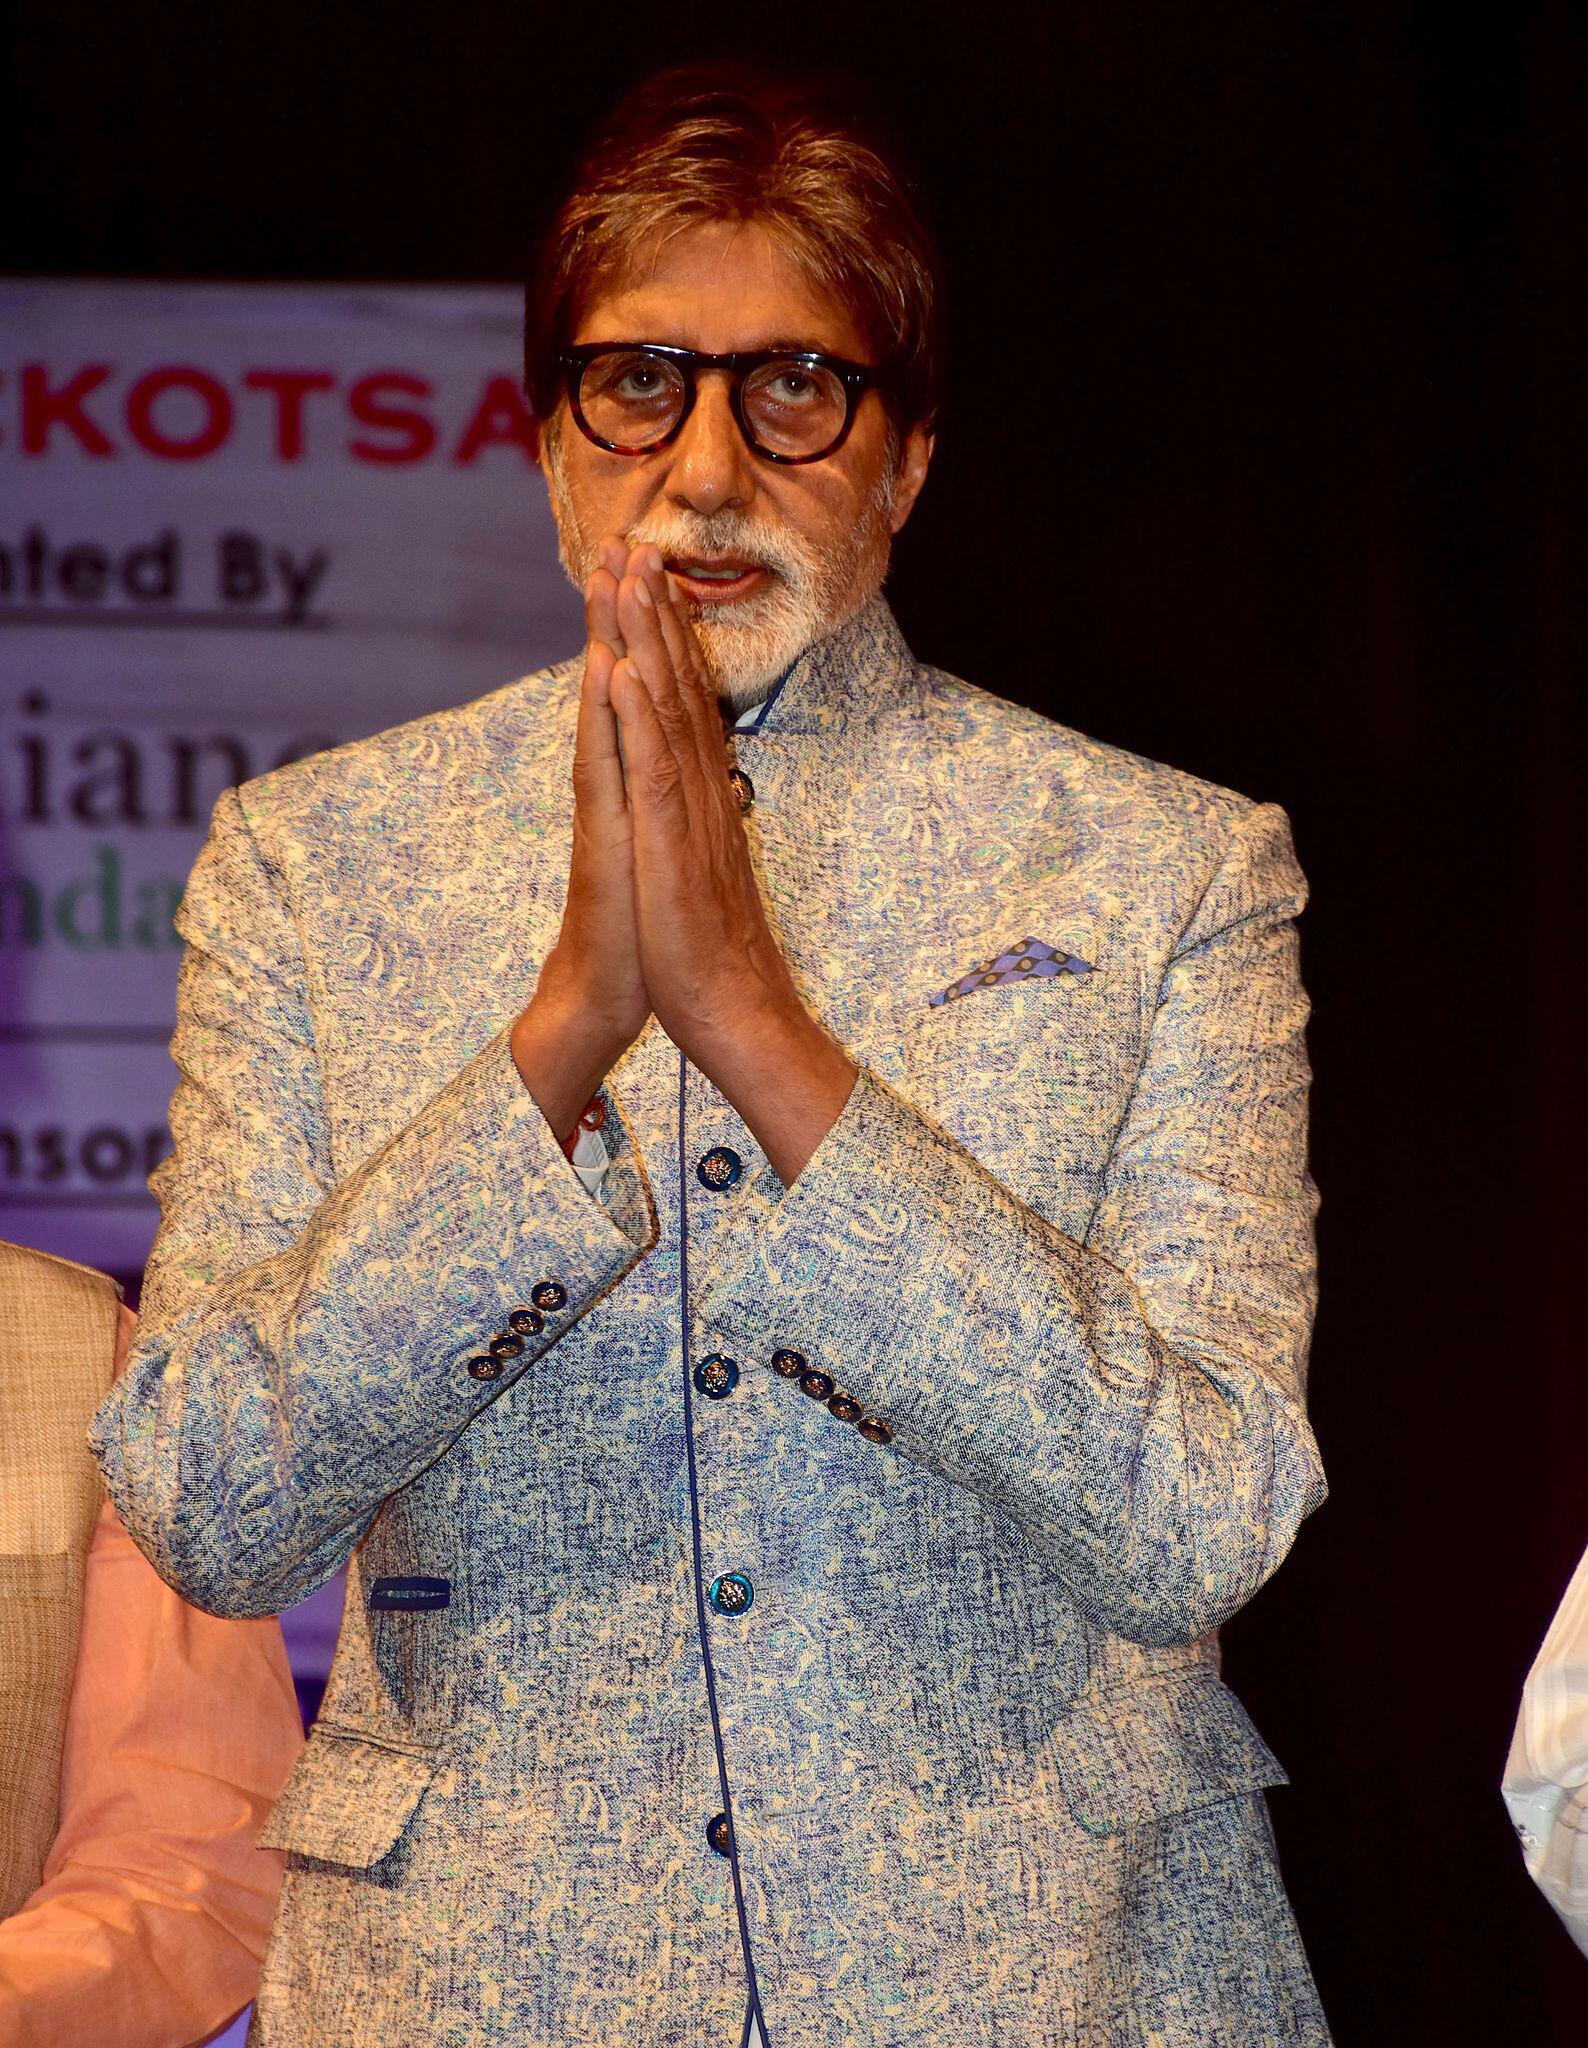 Bild zu Coronavirus - Bollywood-Schauspieler Bachchan